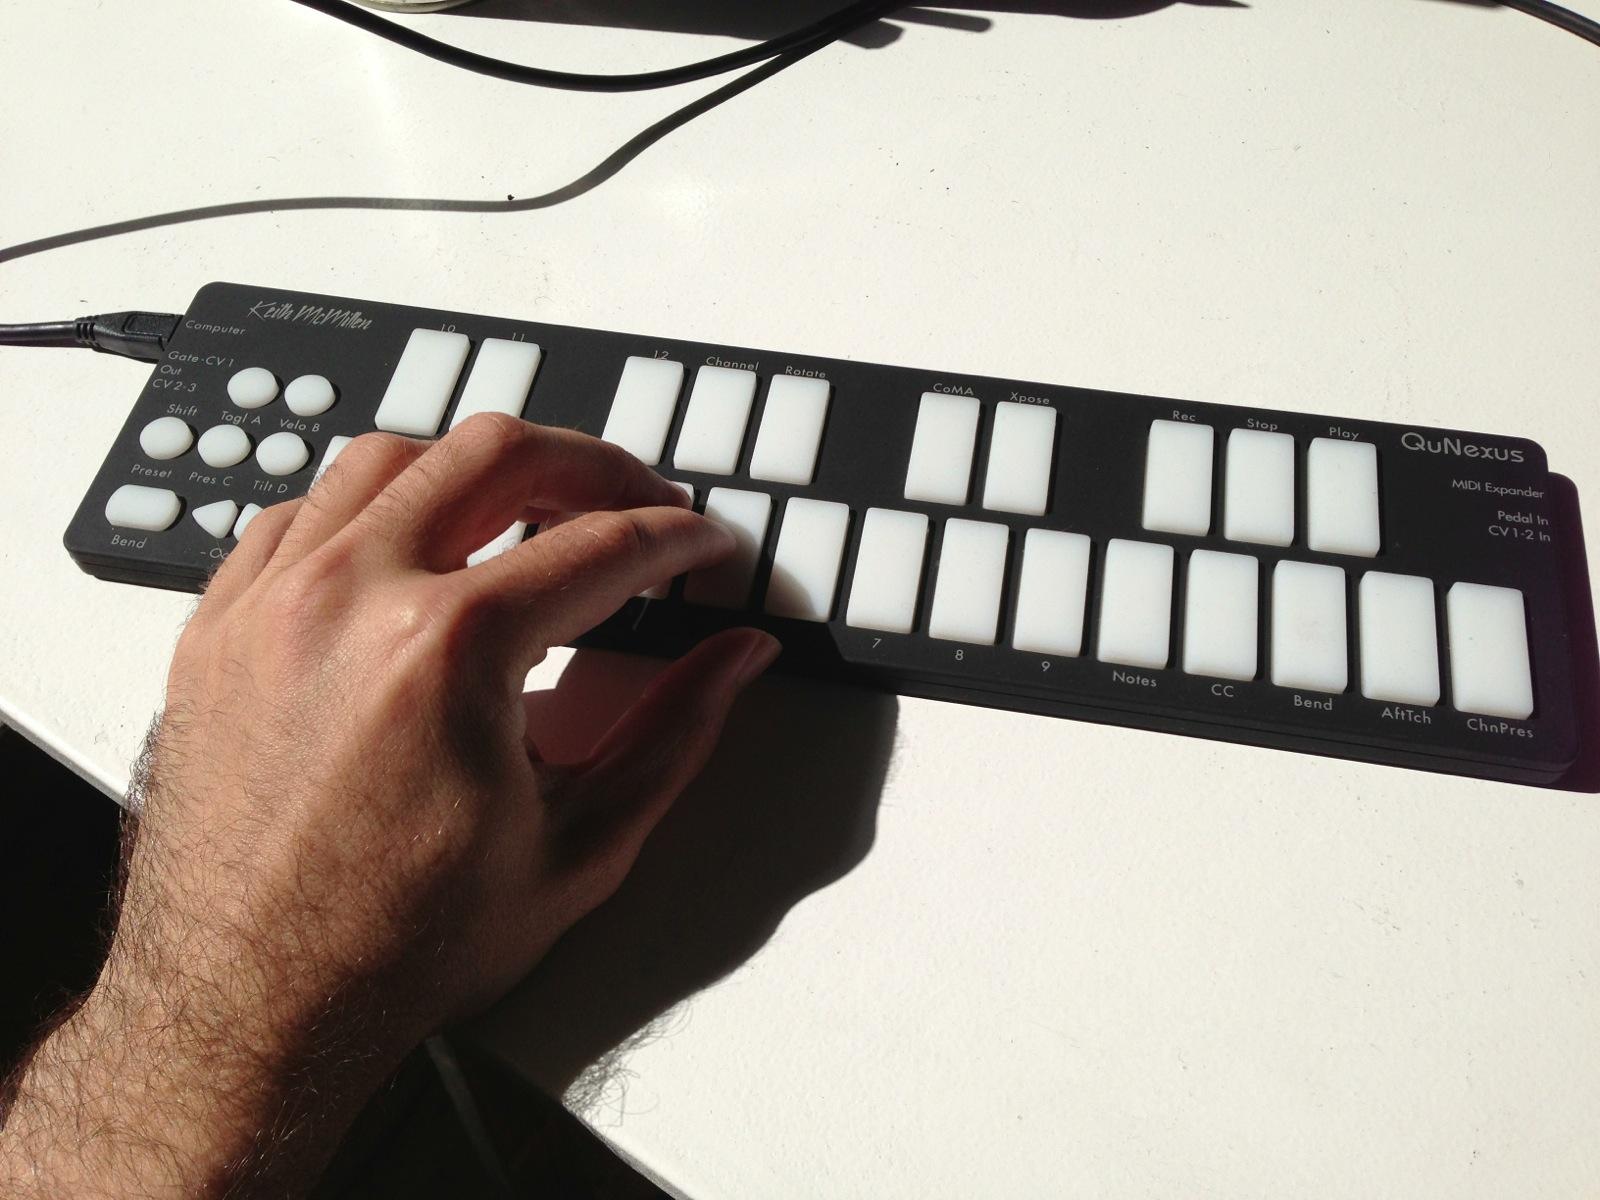 Qunexus Slim Expressive Keyboard In Exclusive Hands On Cdm Review 150 Street Cdm Create